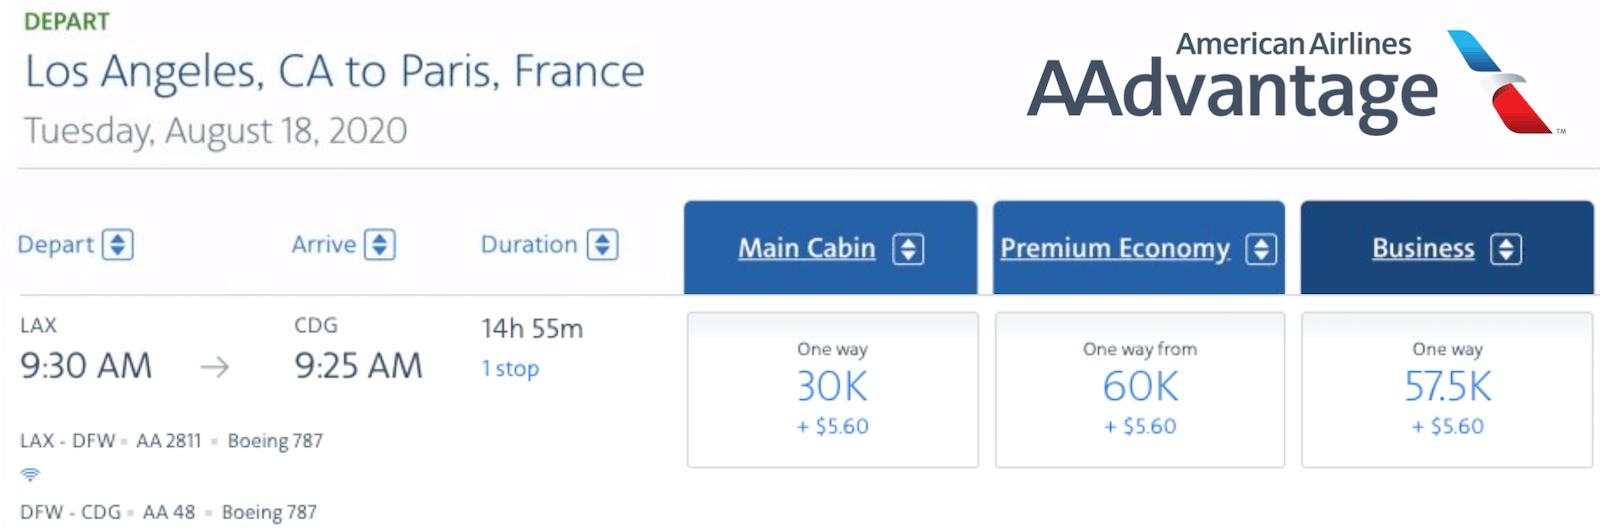 Business saver award for 57,500 flight miles